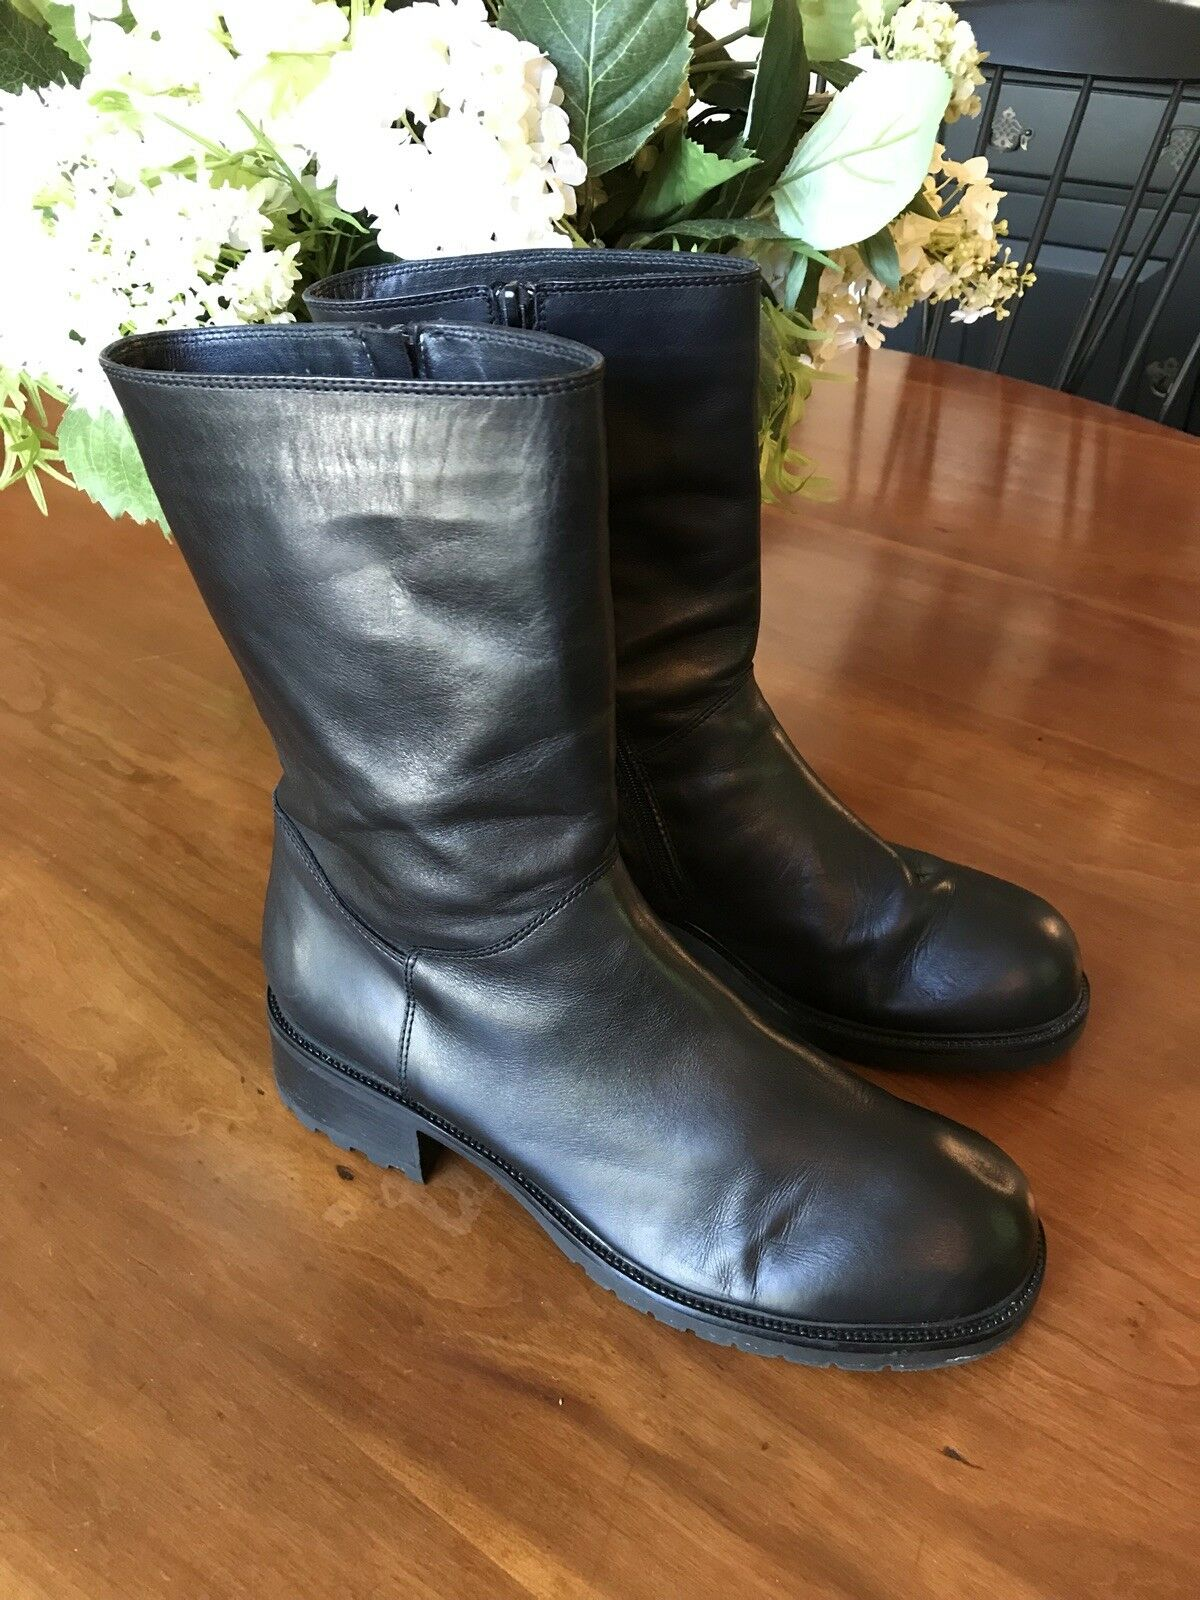 Women's J Crew Black Leather Ankle Booties RubberSole Size 11